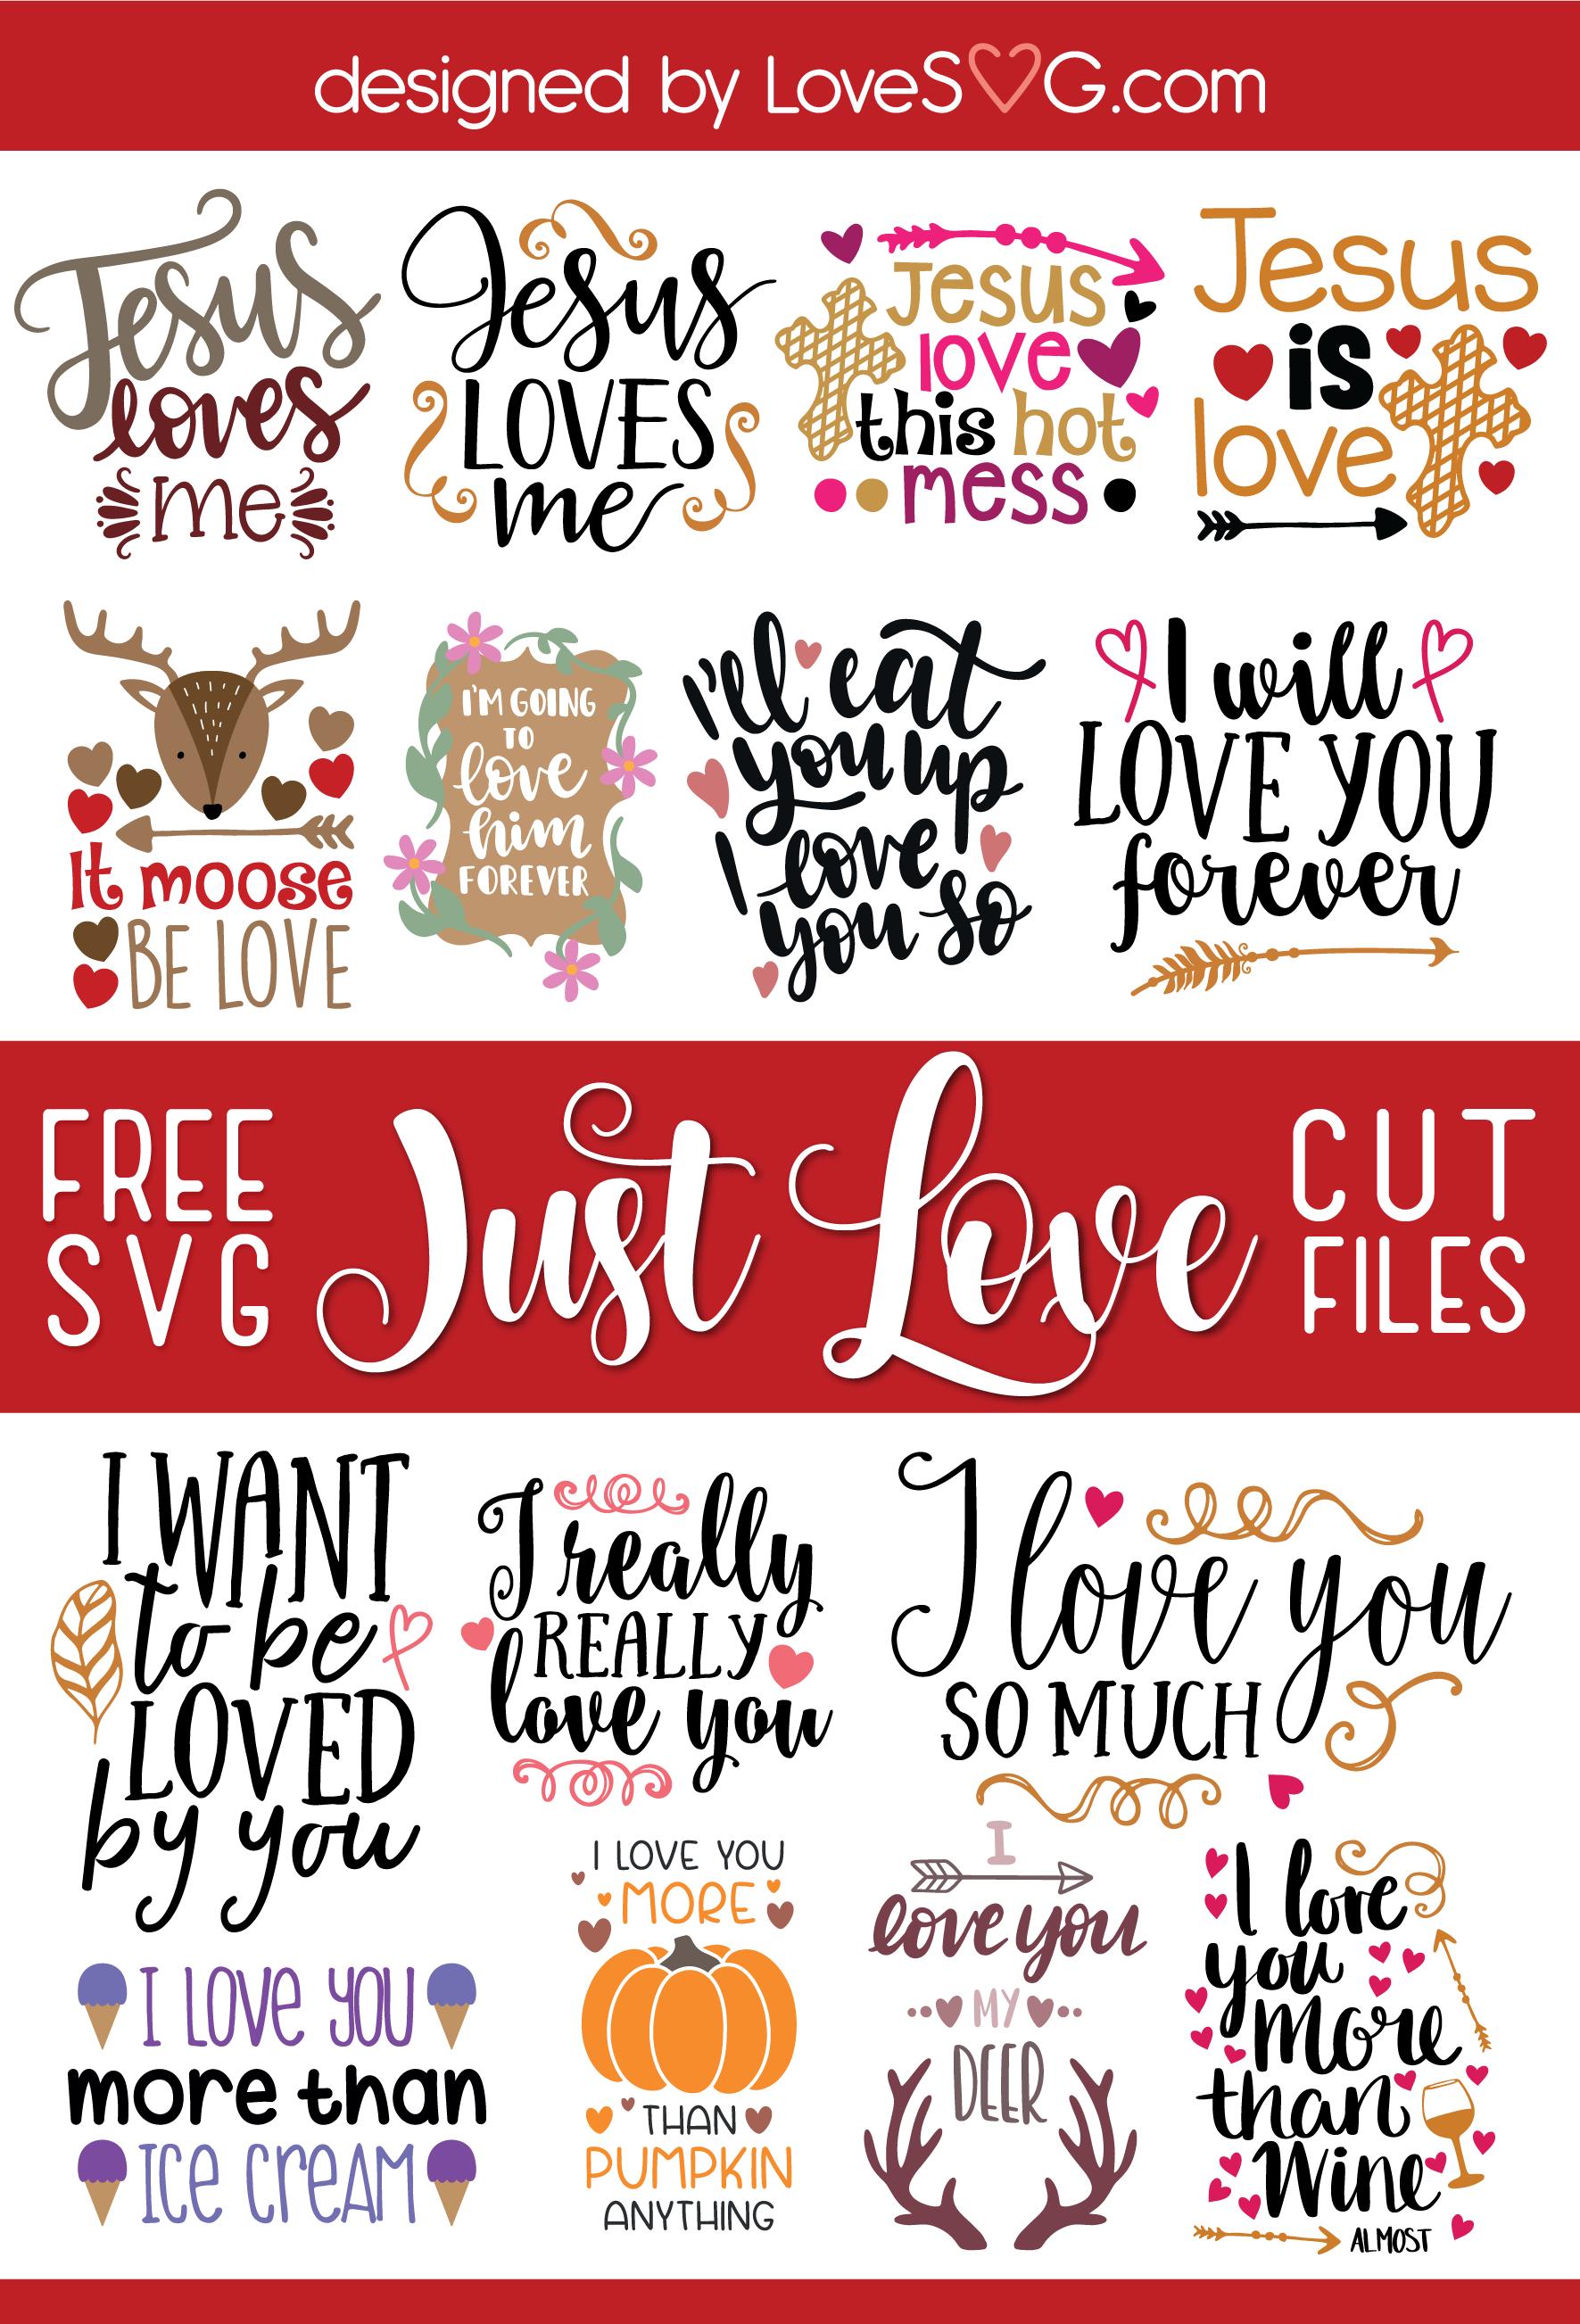 Download Pin on Free Valentine's Day SVG Cut File | LoveSVG.com